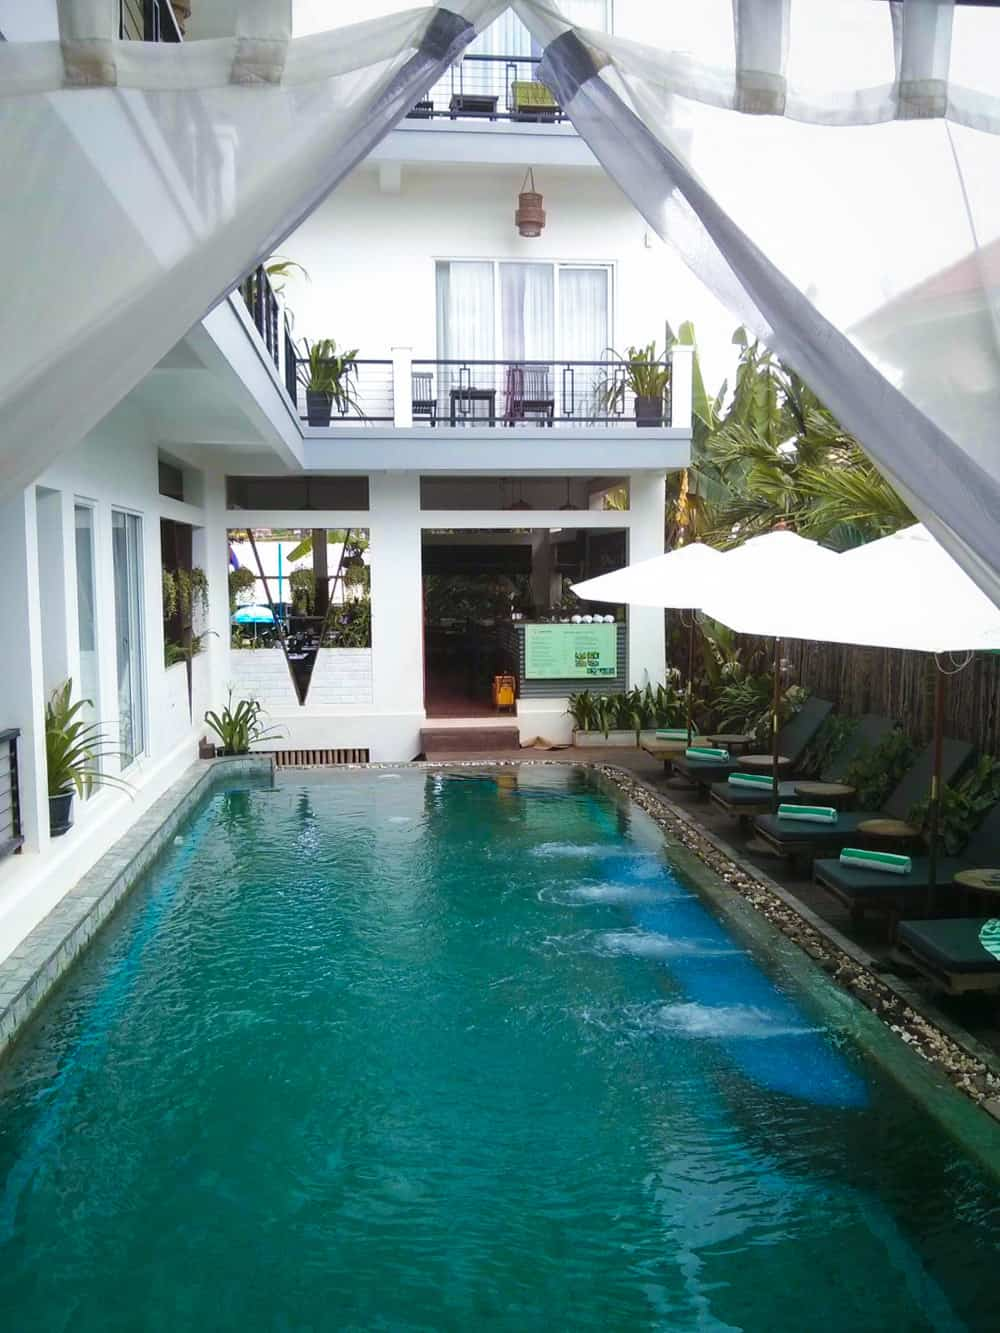 Salt Water Pool in Cambodia